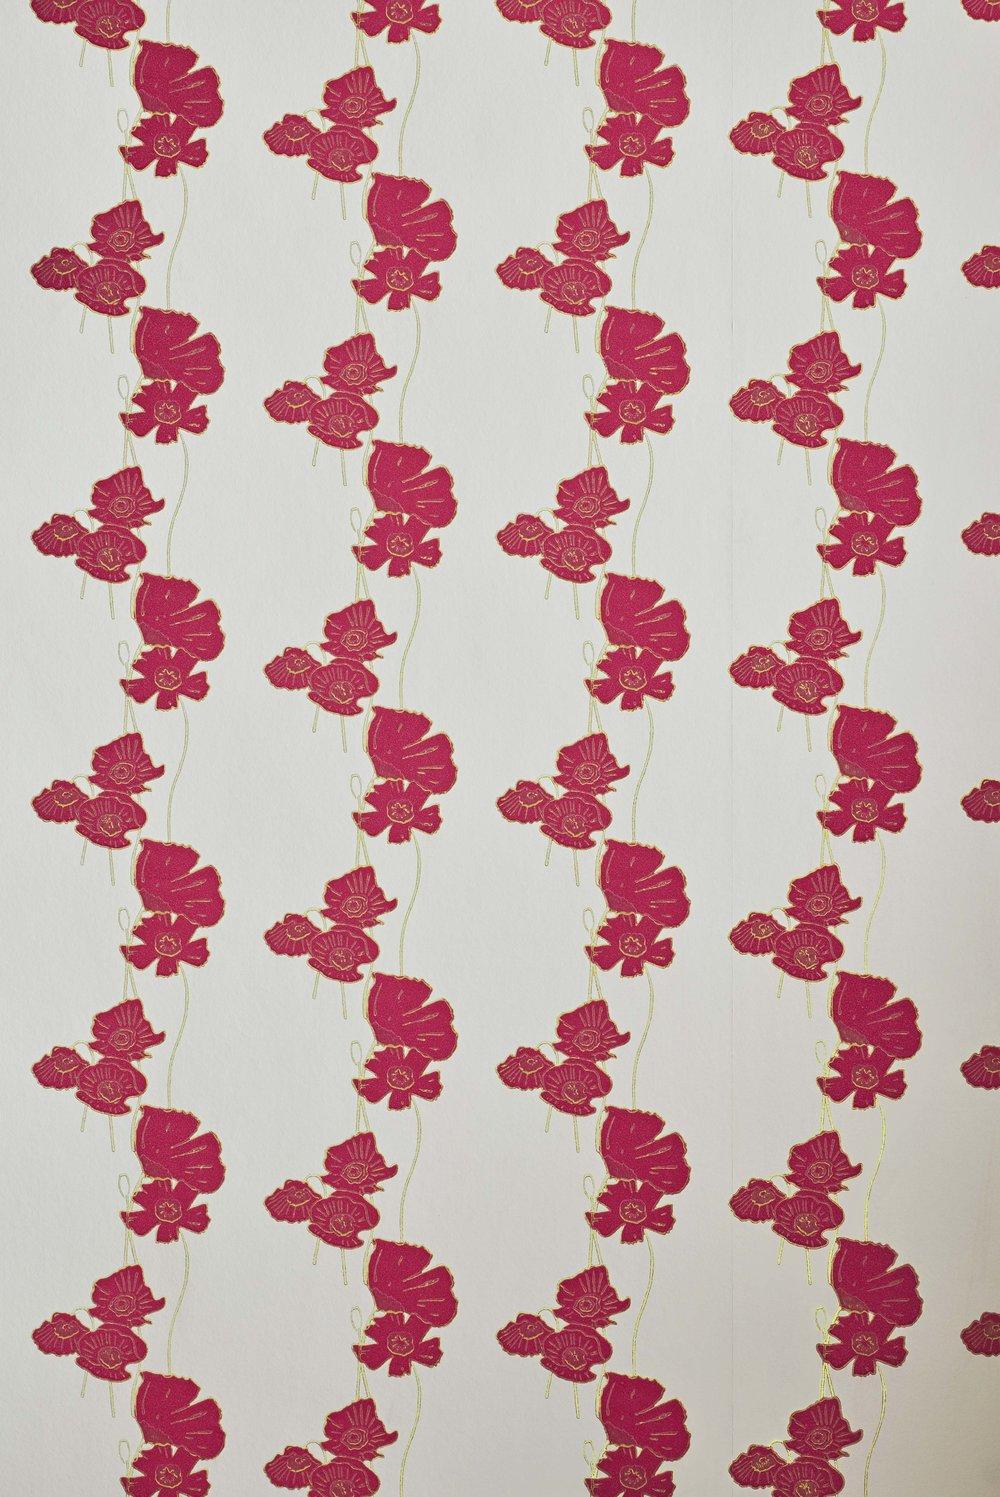 Barneby Gates - Poppy Fields - Red-Gold - Flat 2.jpg